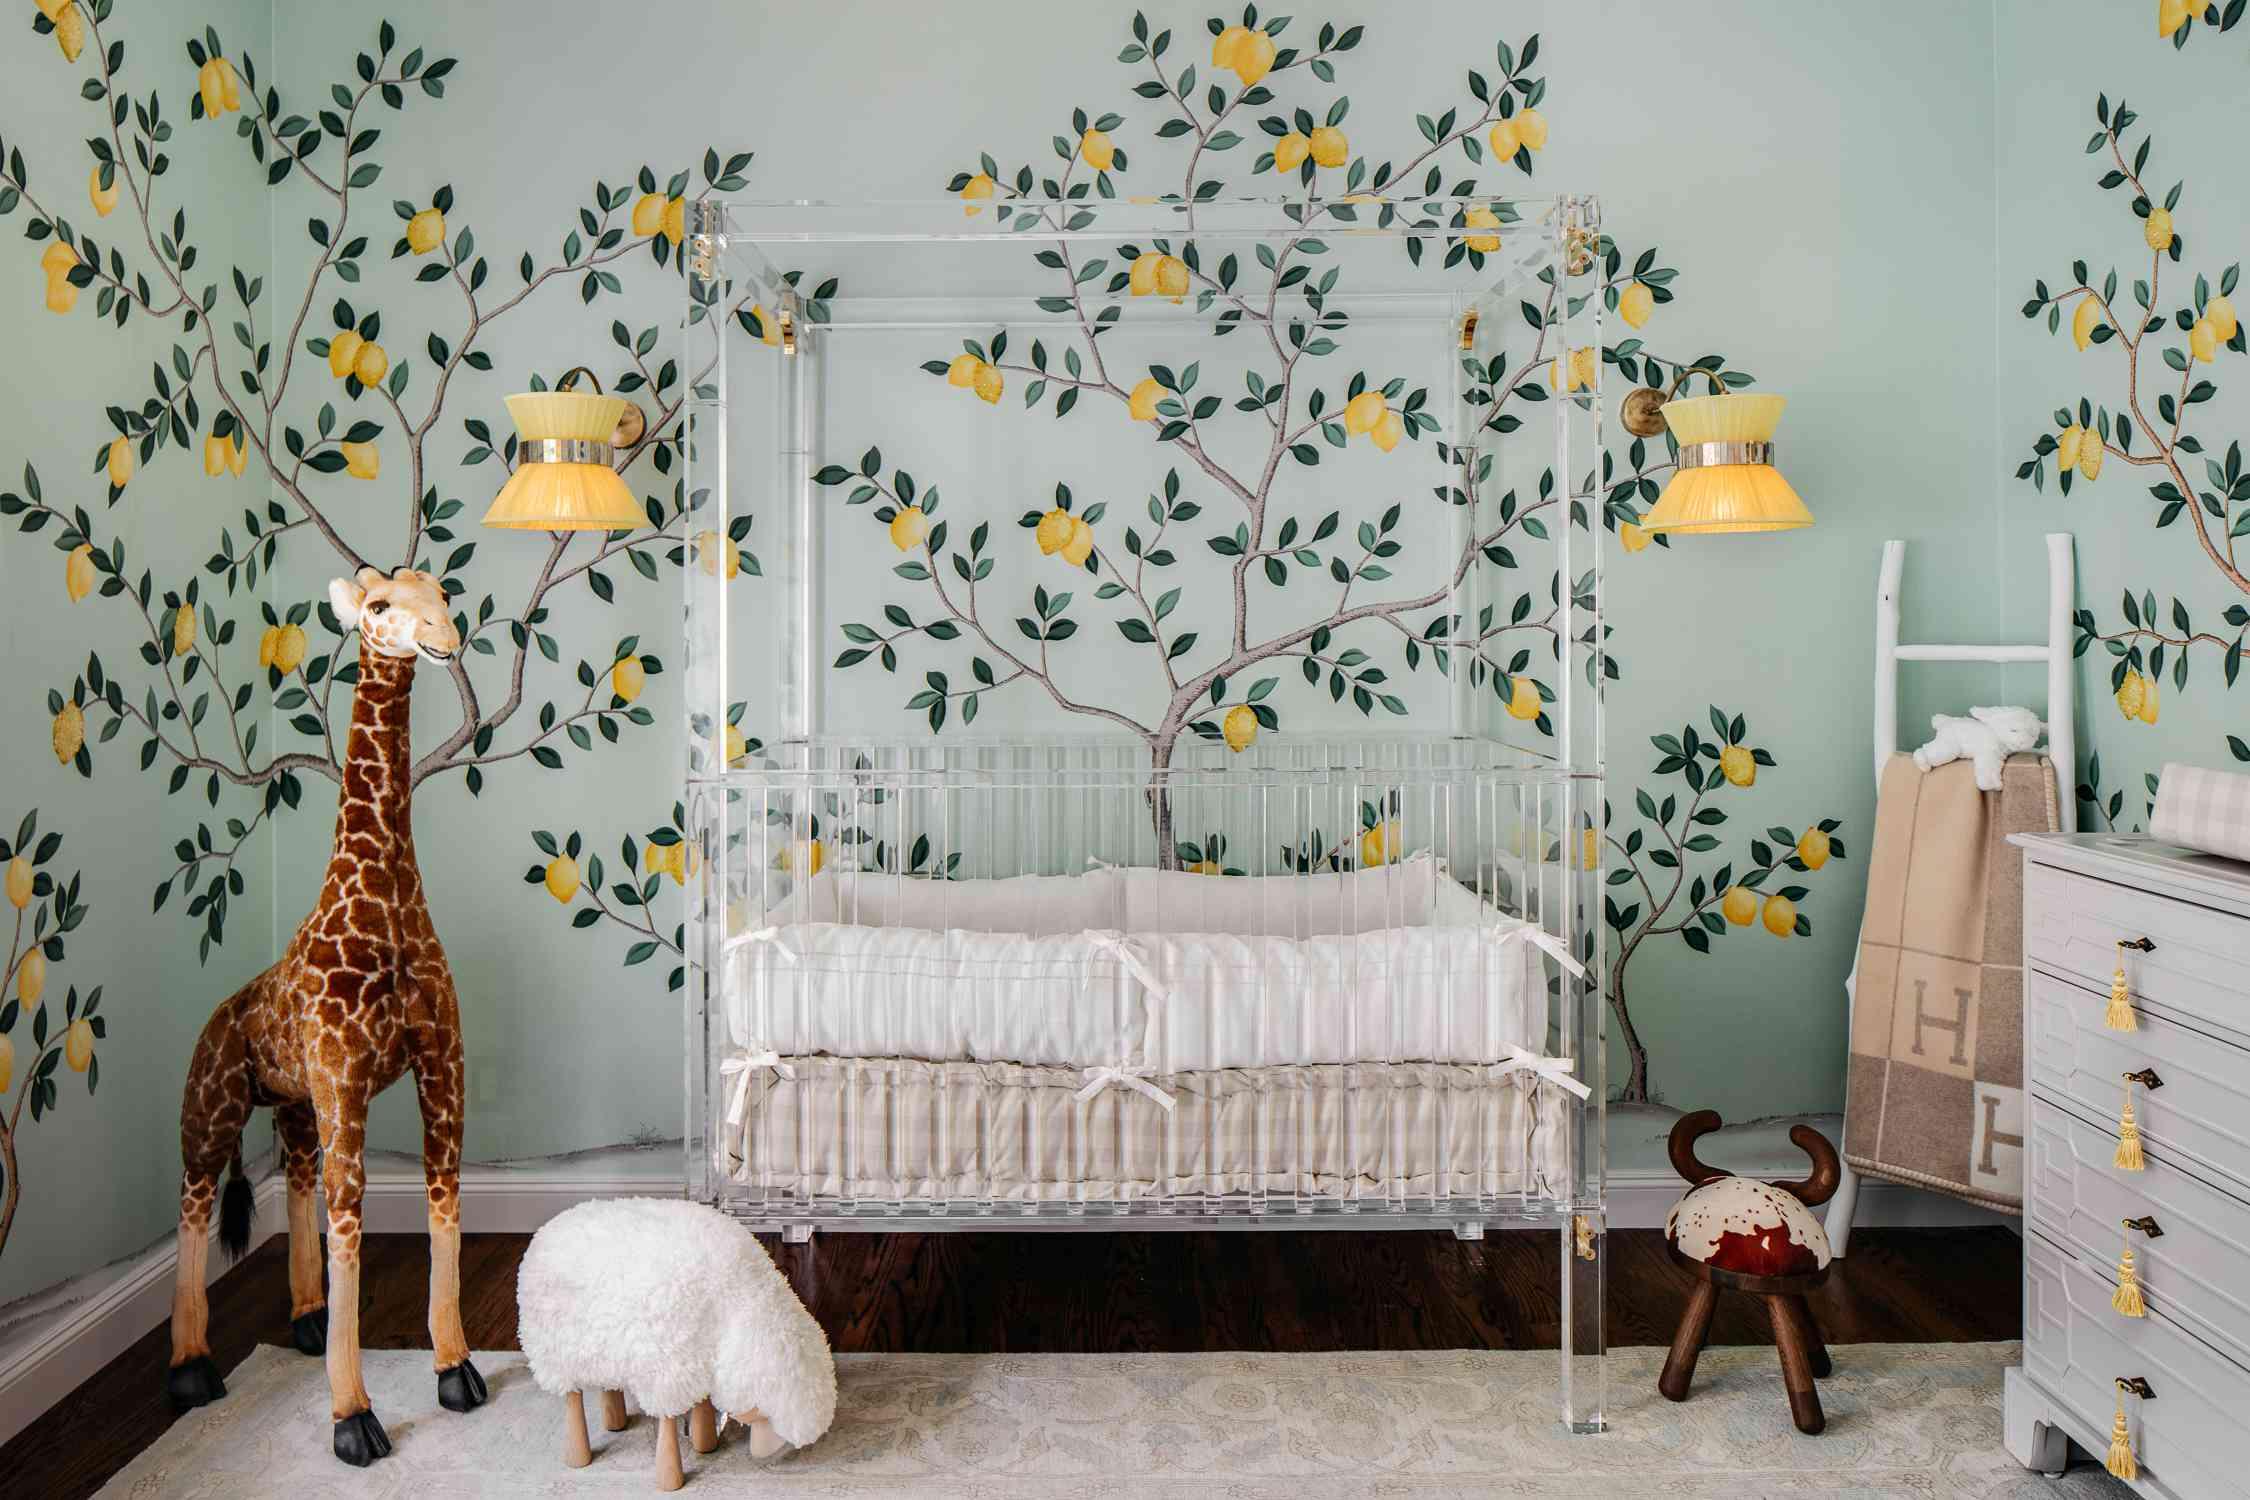 Makeover of the Week - Dina Bandman Nursery with Amalfi Coast Theme After With Crib